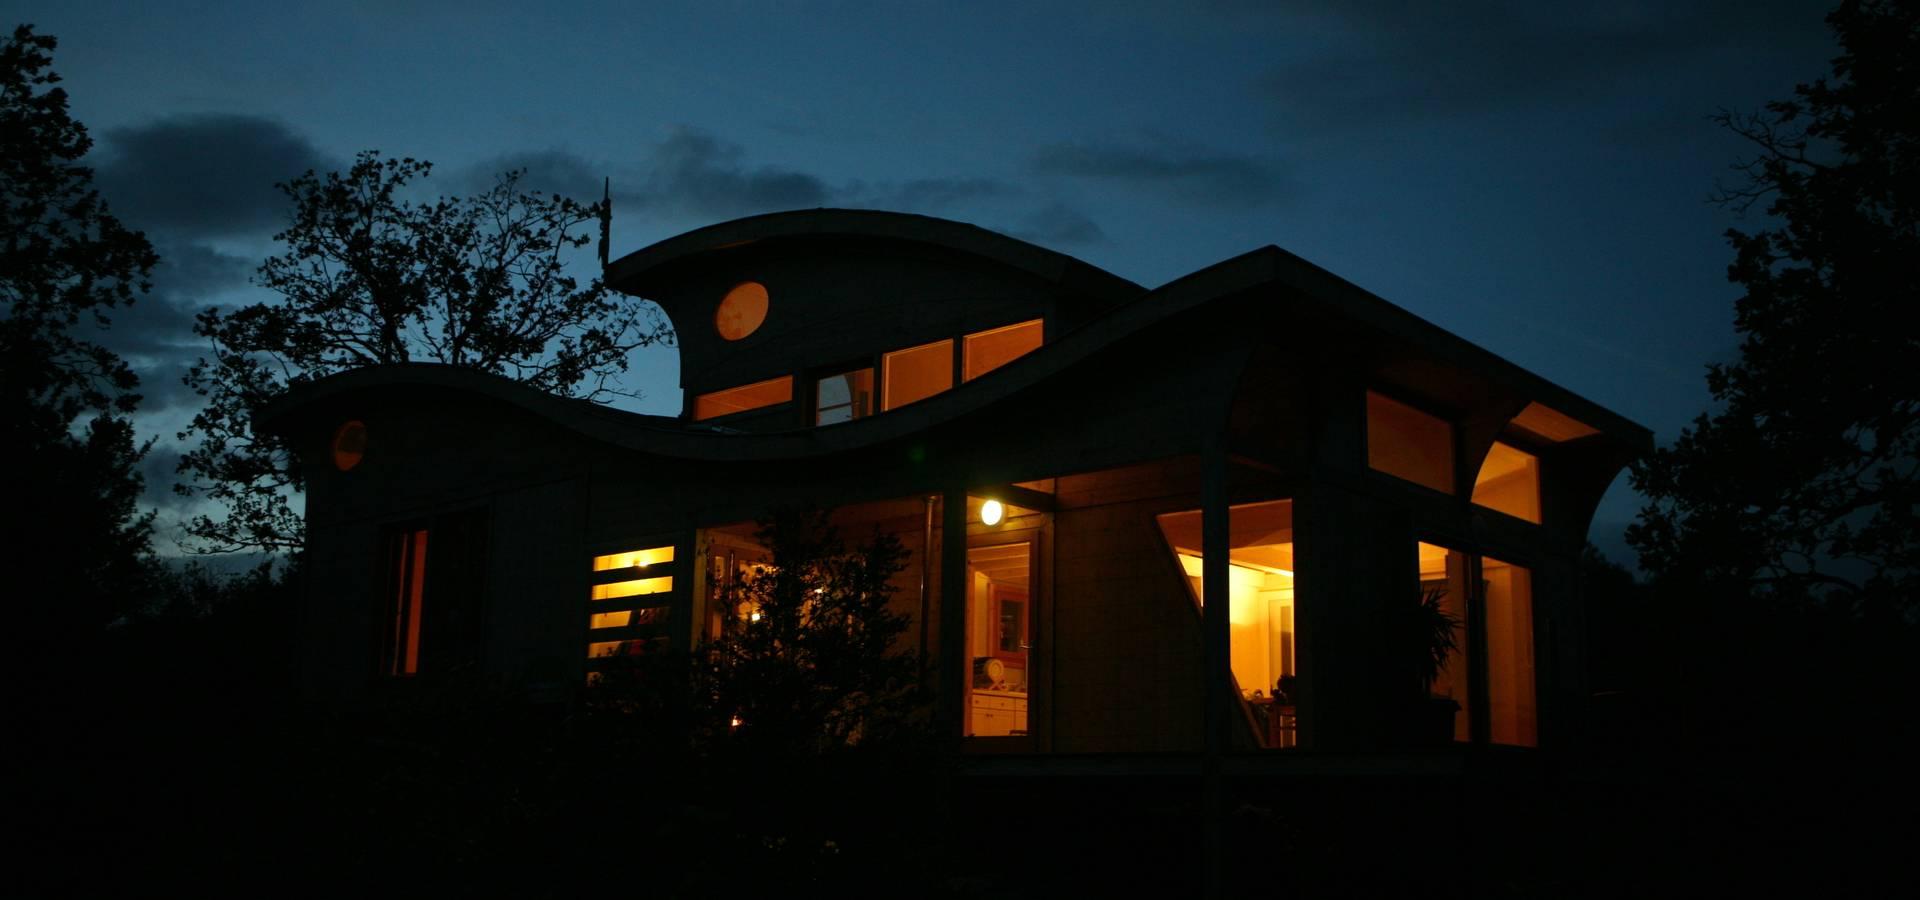 maison cologique de jos bov by eco designer homify. Black Bedroom Furniture Sets. Home Design Ideas